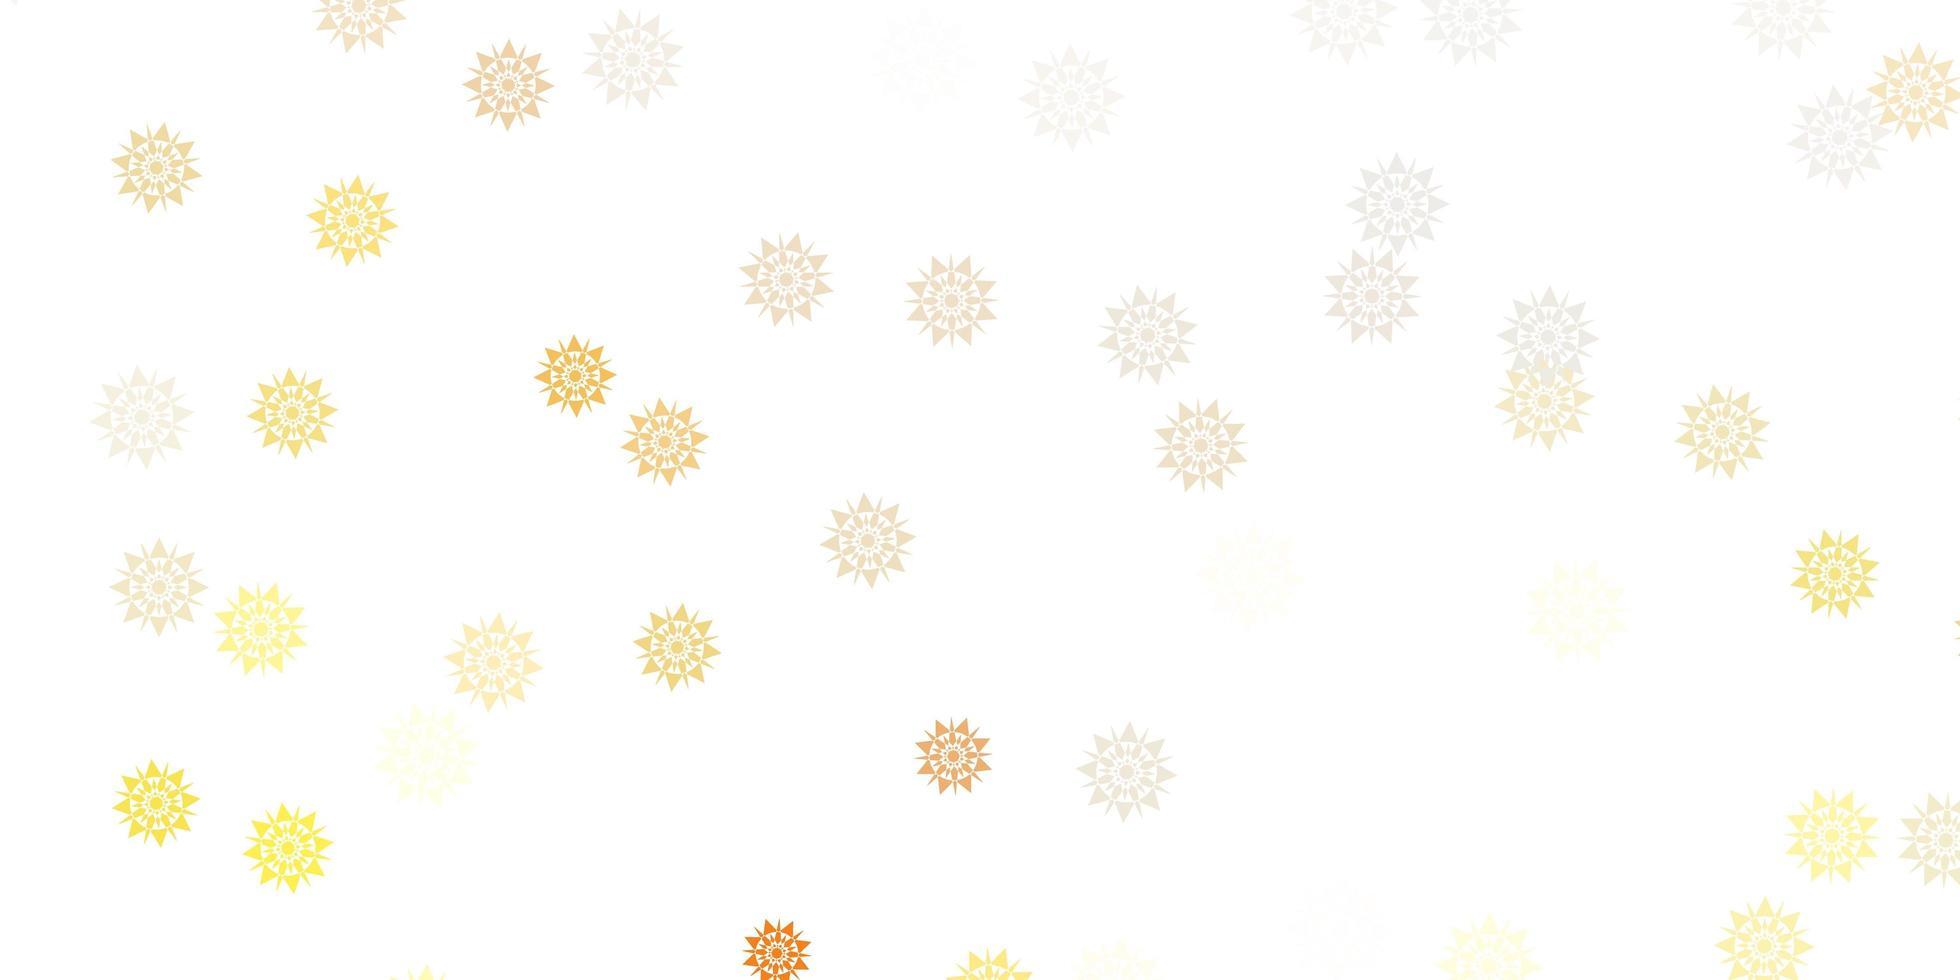 fundo vector laranja claro com flocos de neve de Natal.